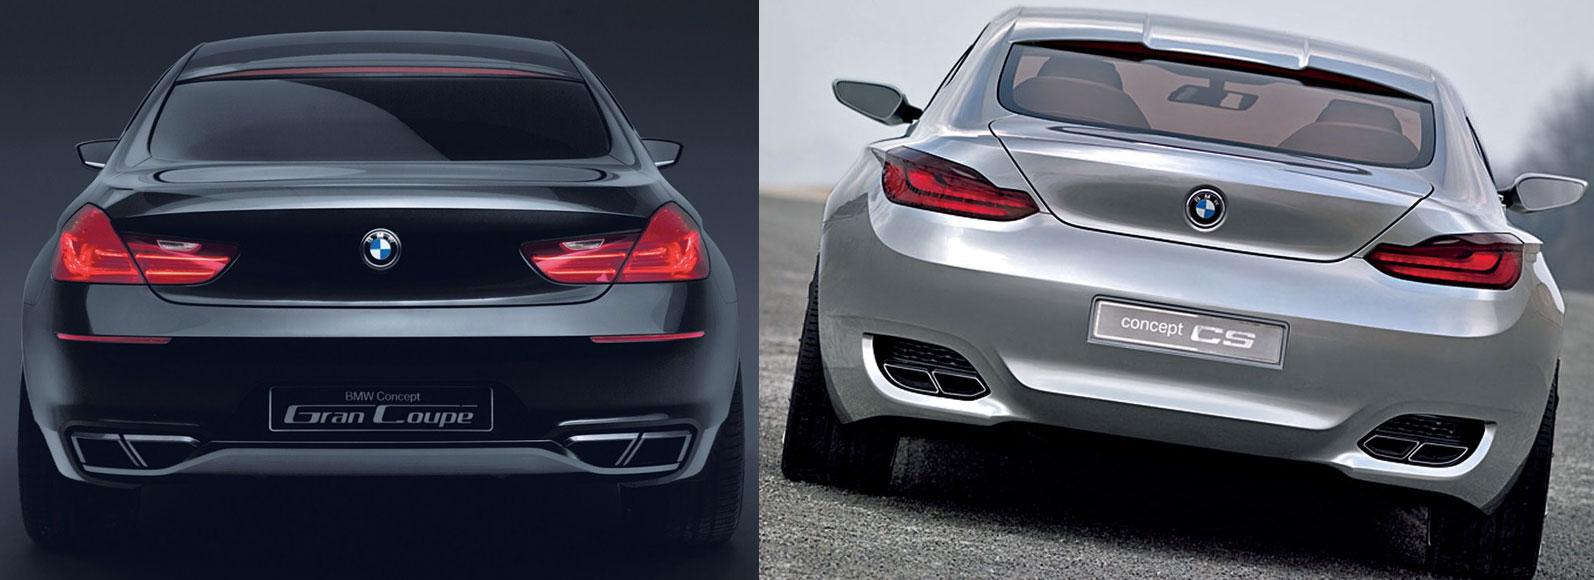 bmw gran coupe vs cs concept 31